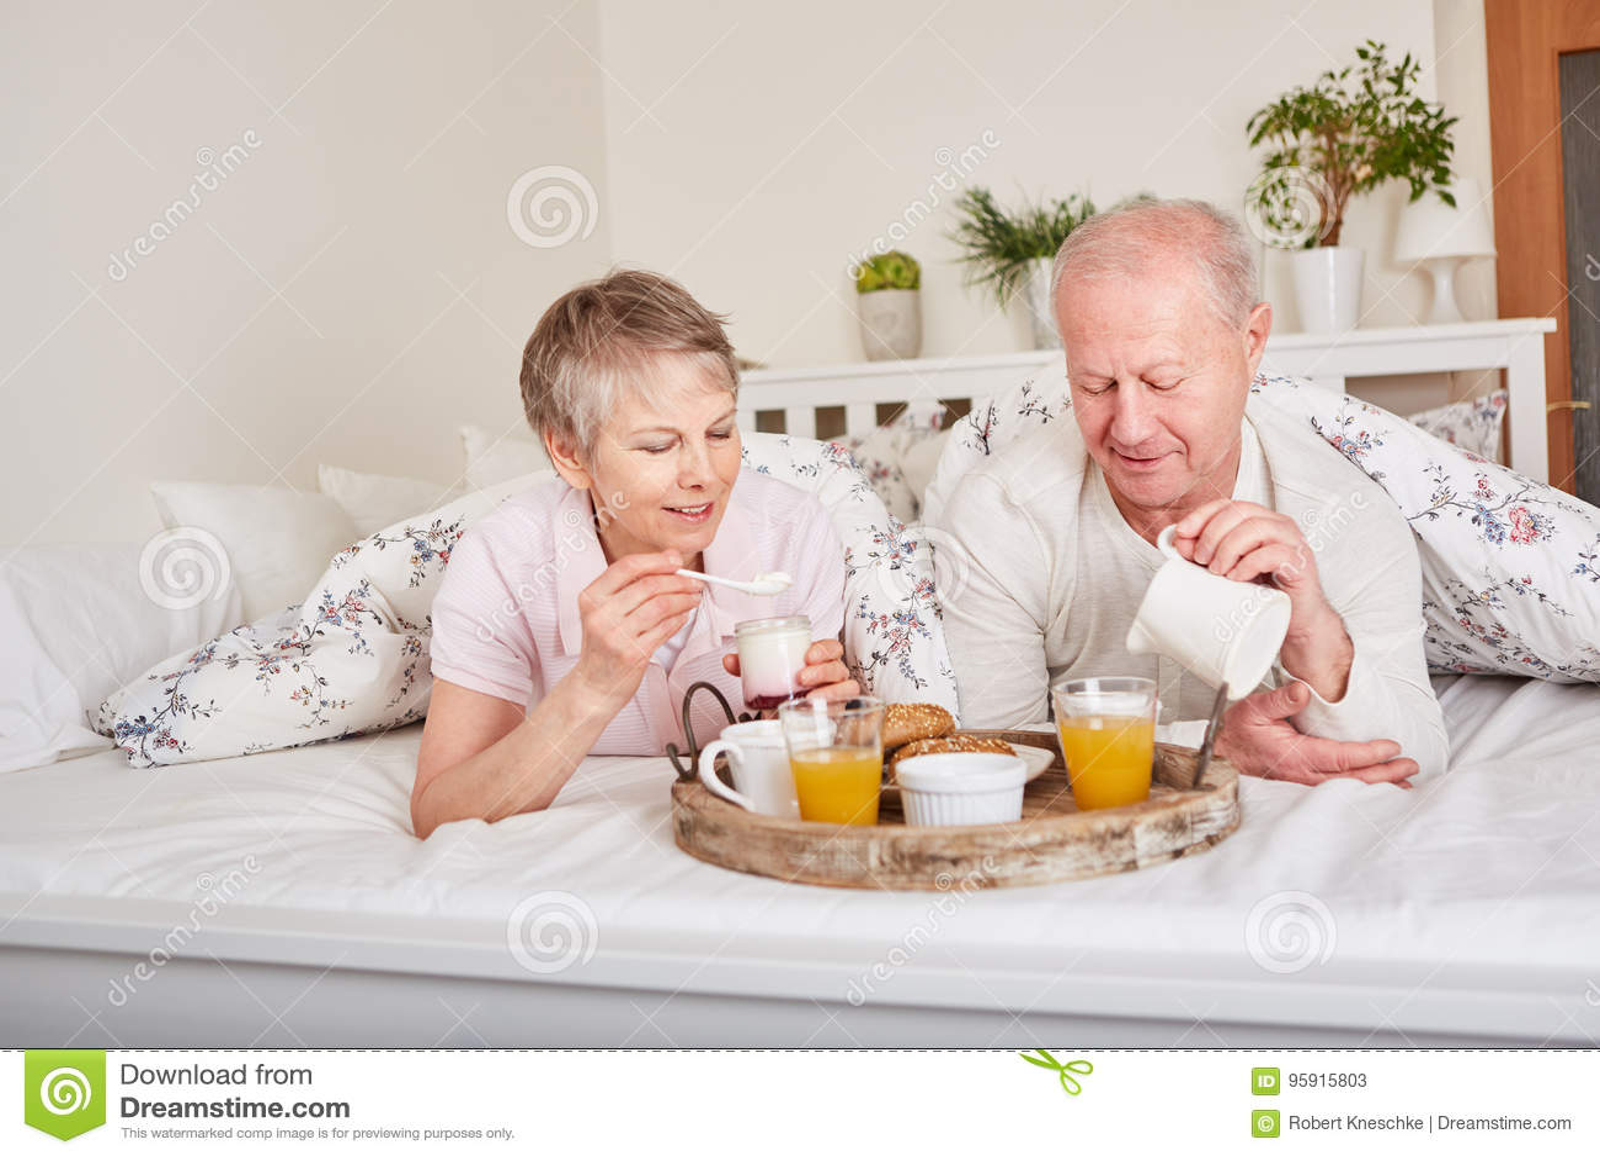 Ältere Bürger, die im Bett frühstücken